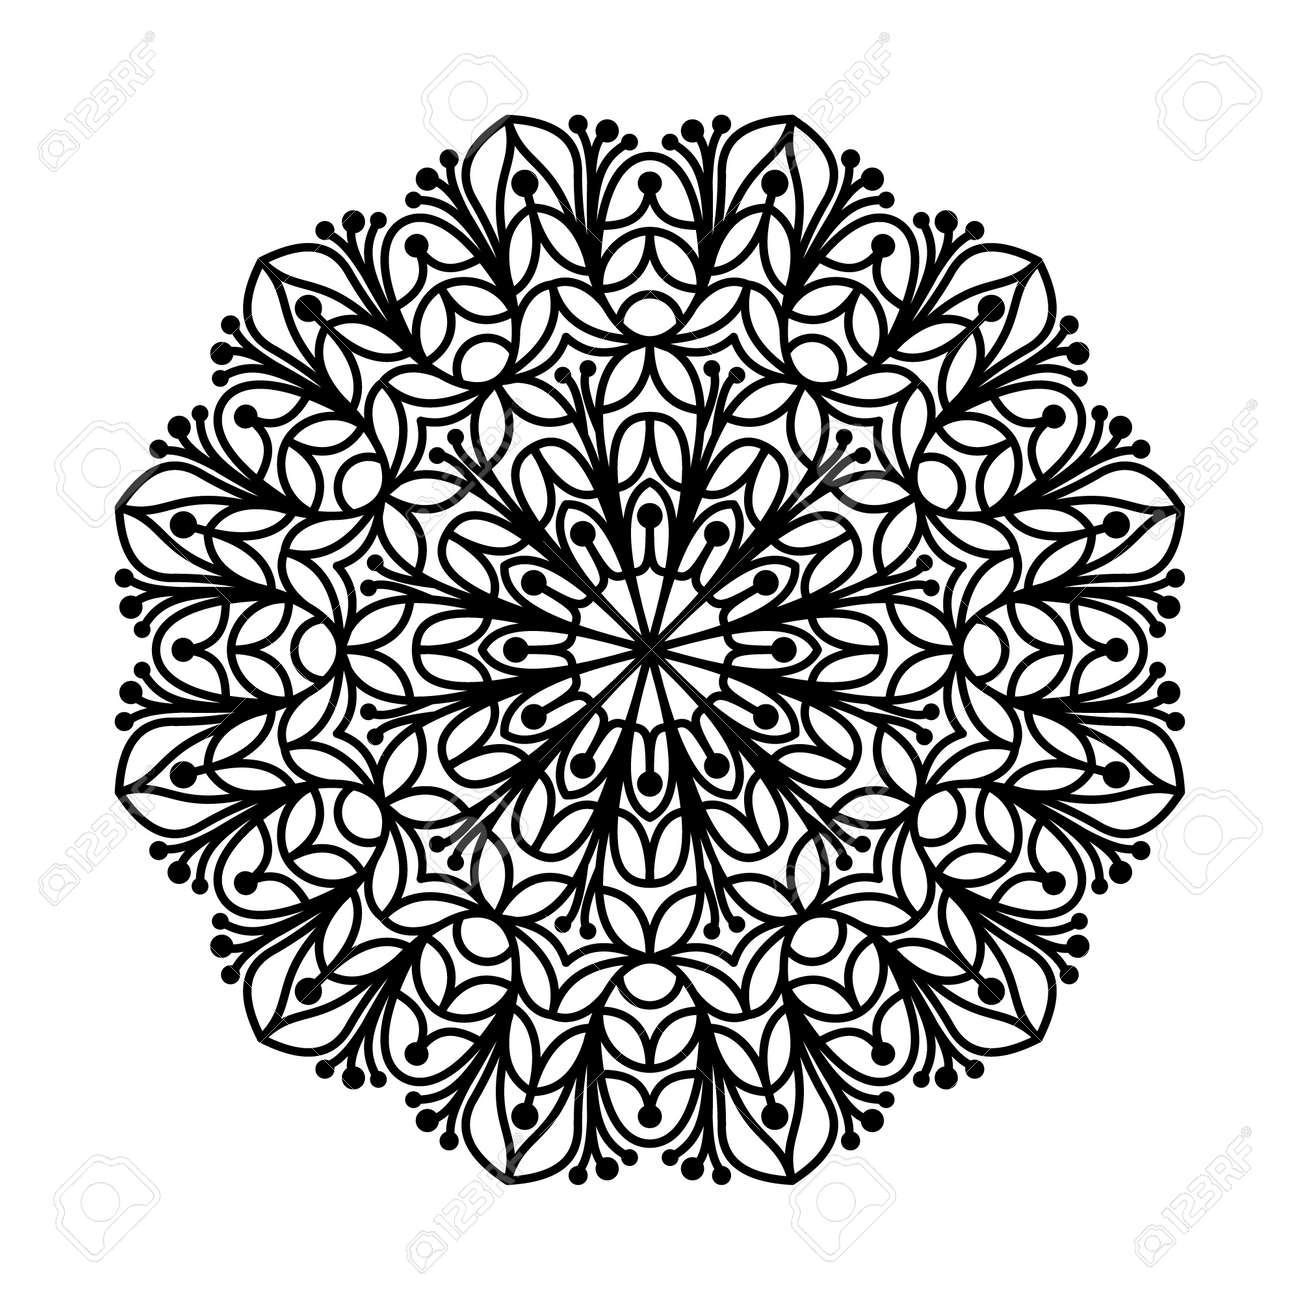 Mandala Contorno. Mandala Lineal Aislado En El Fondo Blanco. Anti ...